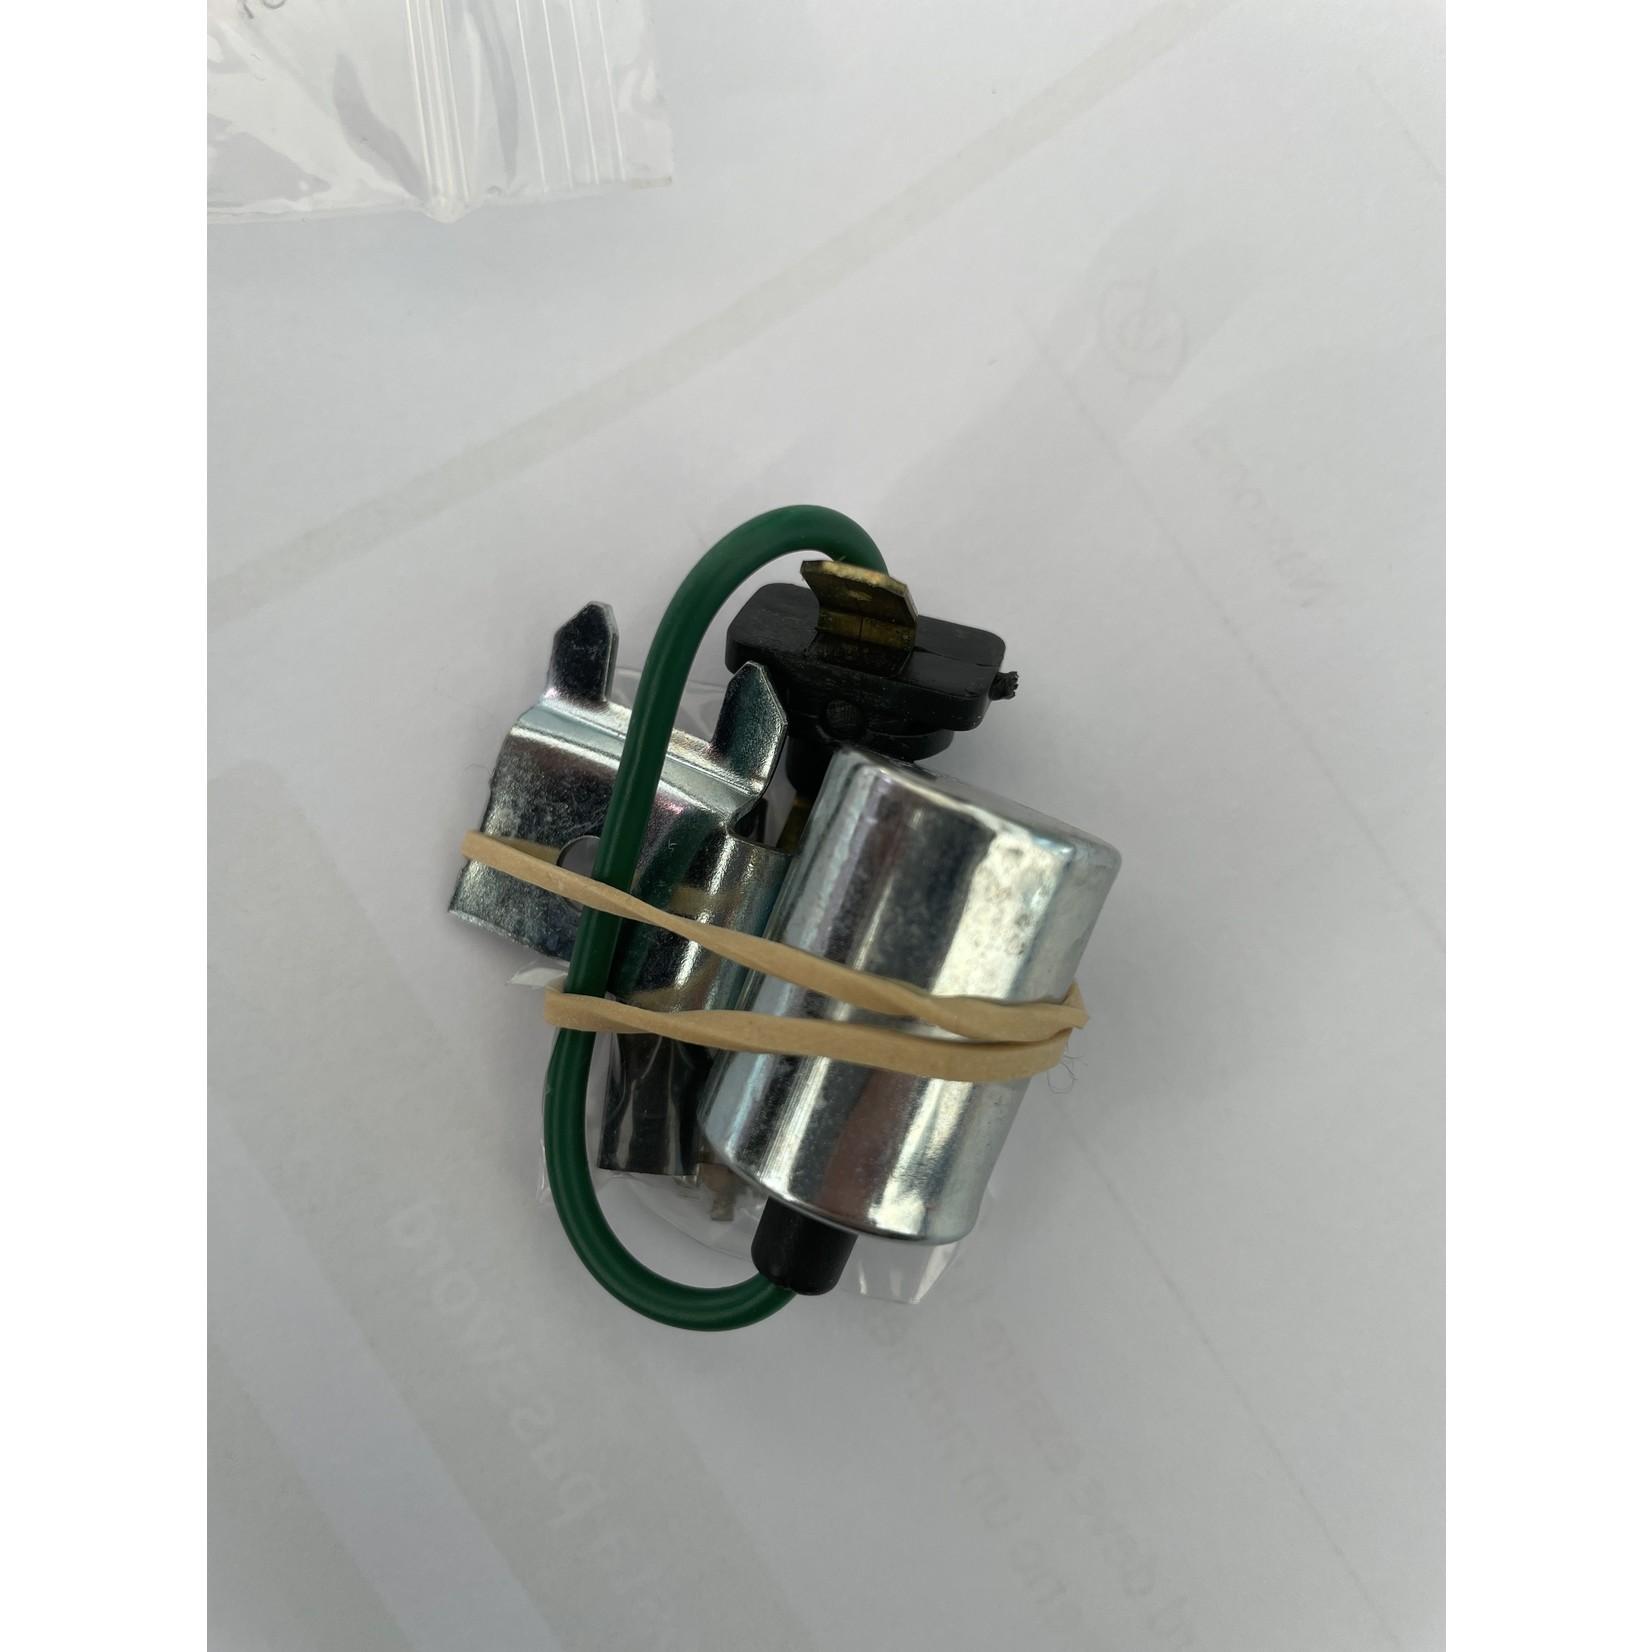 Condensador Bosch Nr Org: DX211208A